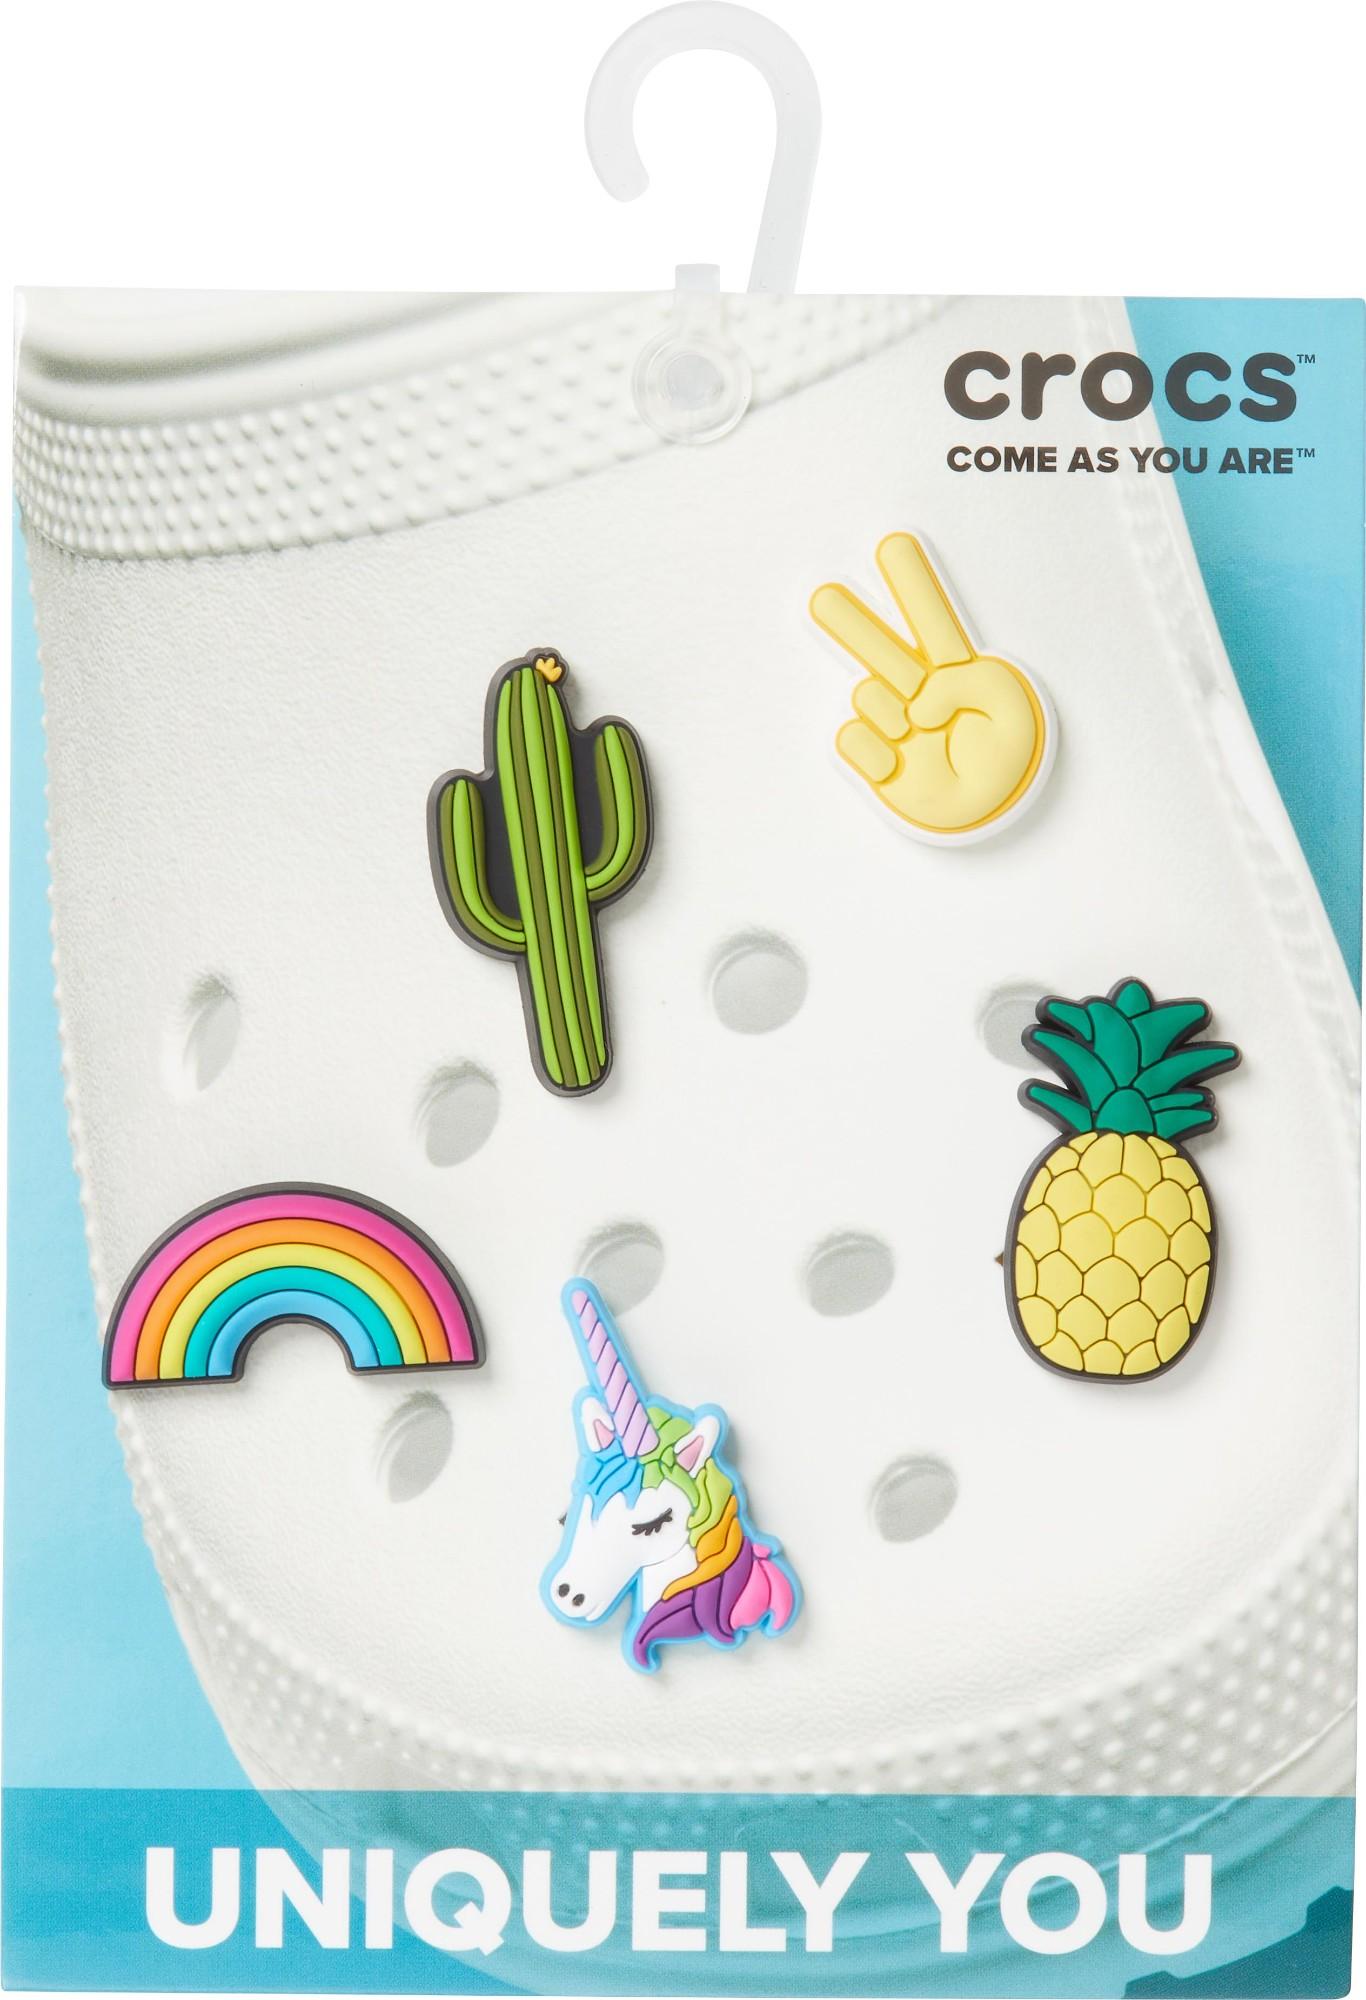 Crocs™ Crocs FUN TREND 5 PACK G0692900-MU